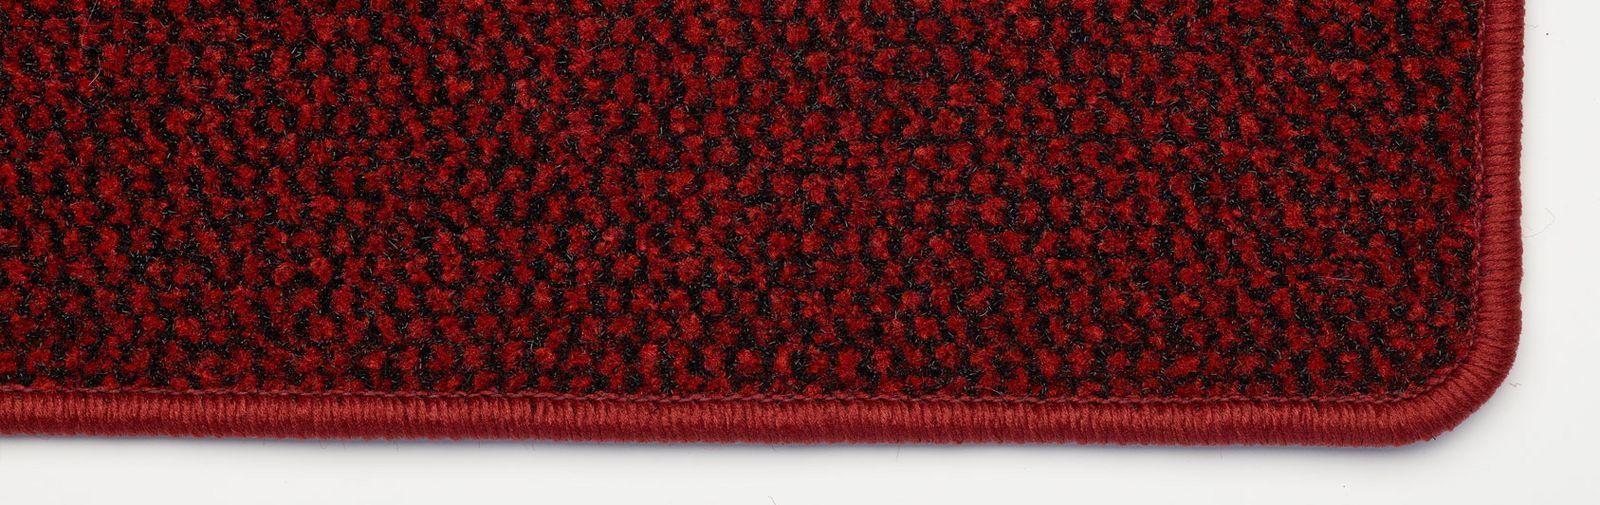 dirt trapper carpet focus color red color code 25.04